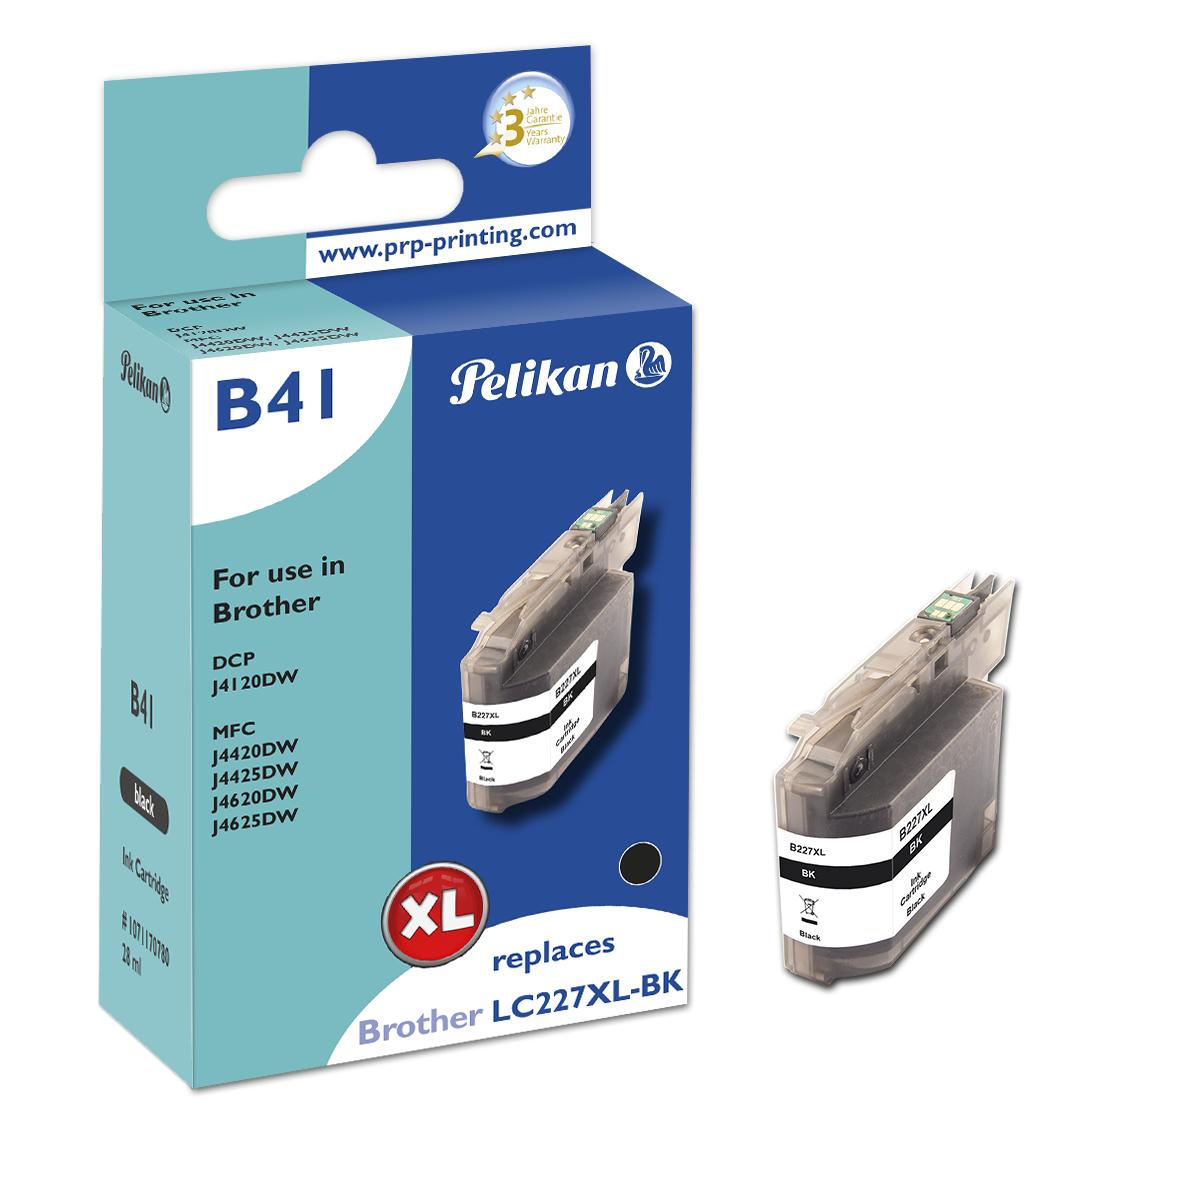 Pelikan B41 Black - Box - Tintenpatrone Kompatibel - Schwarz